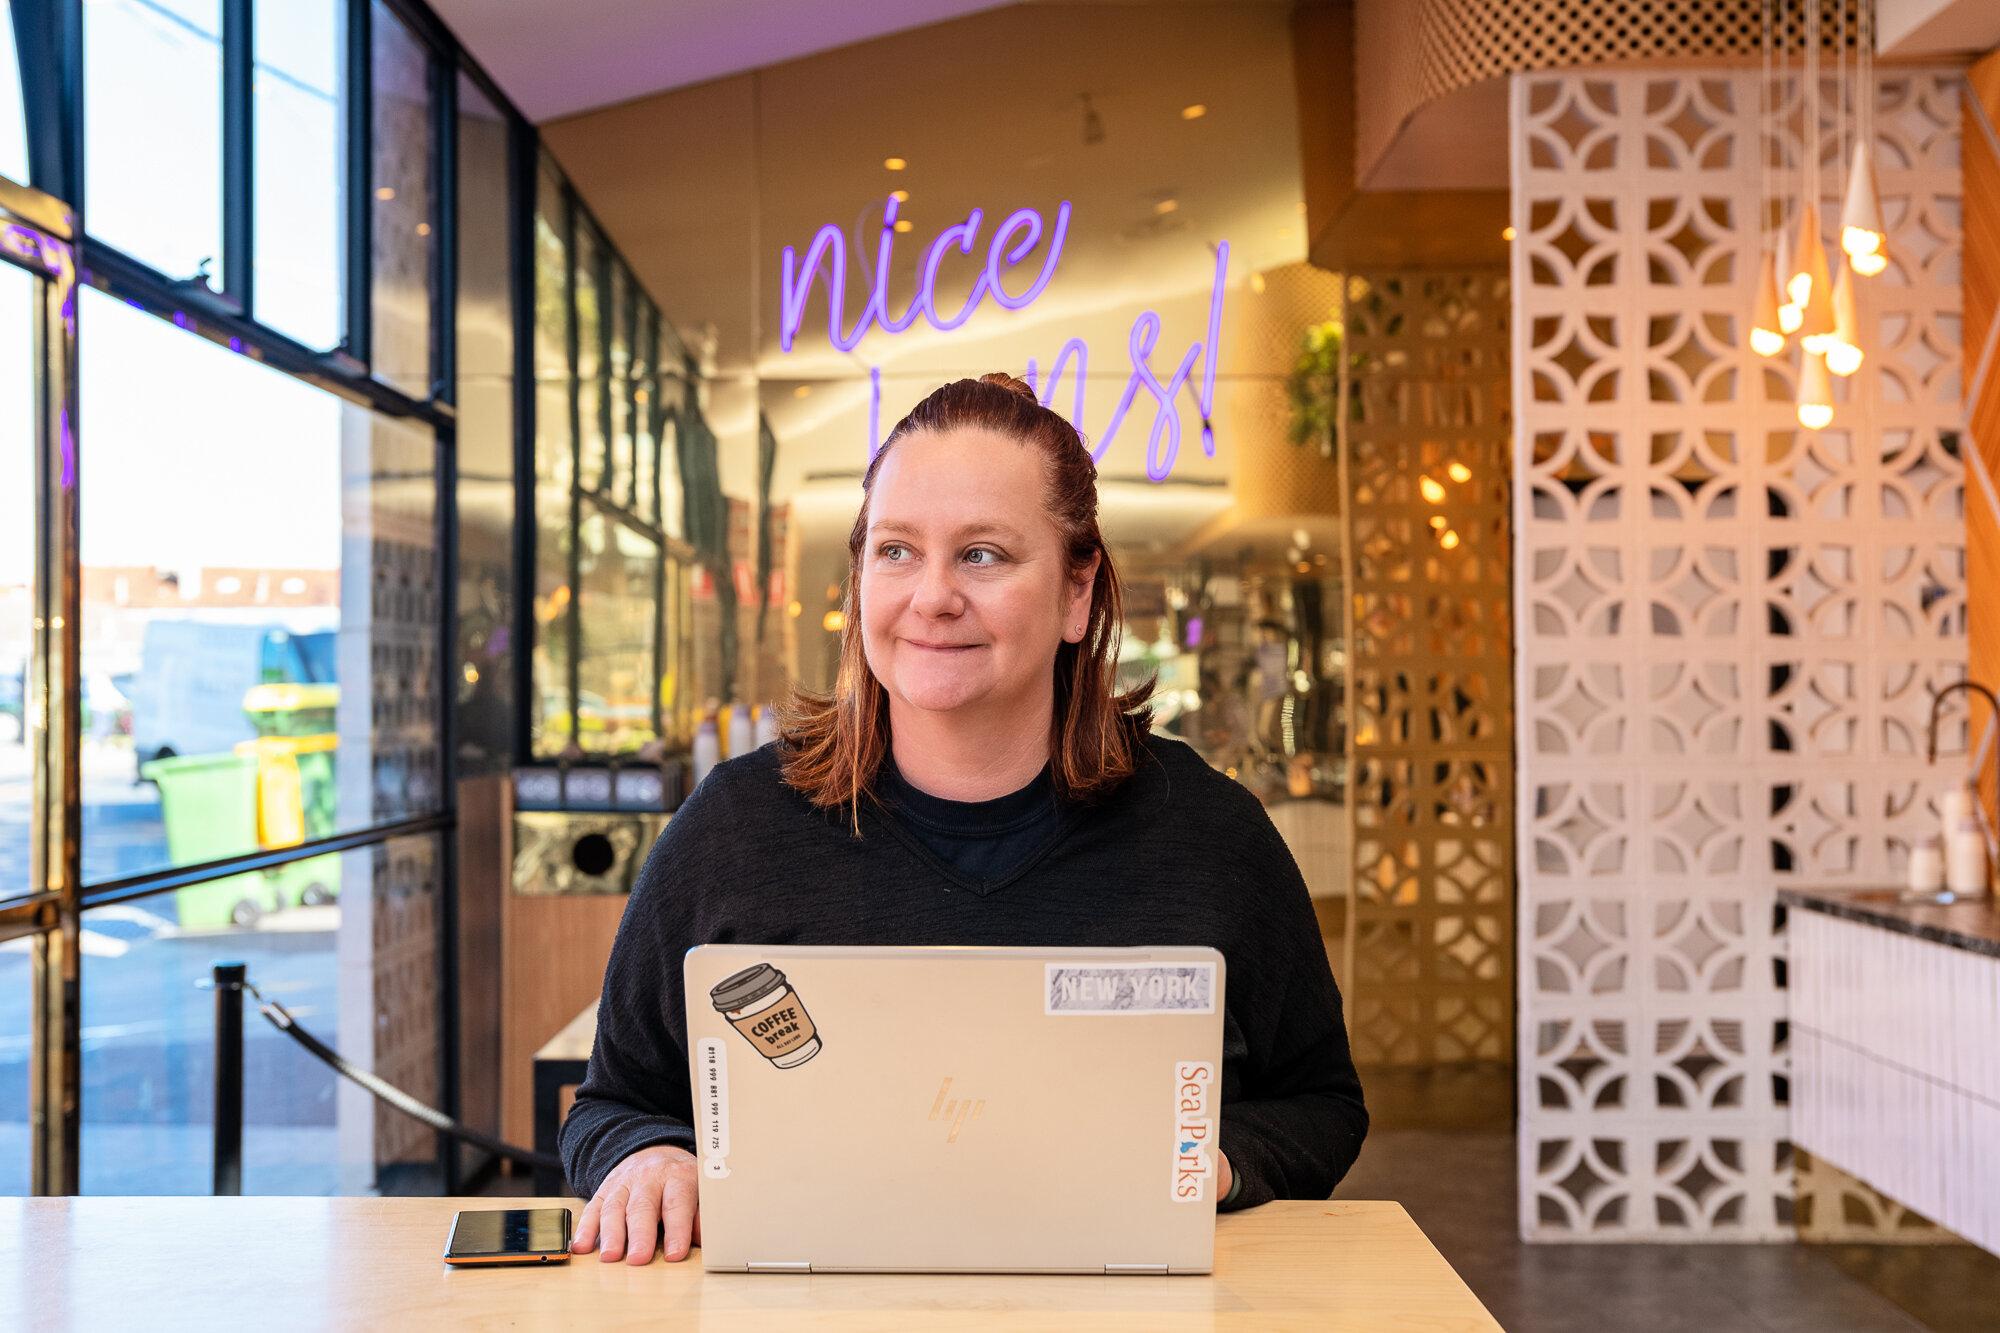 Bayside Women in Business Brighton